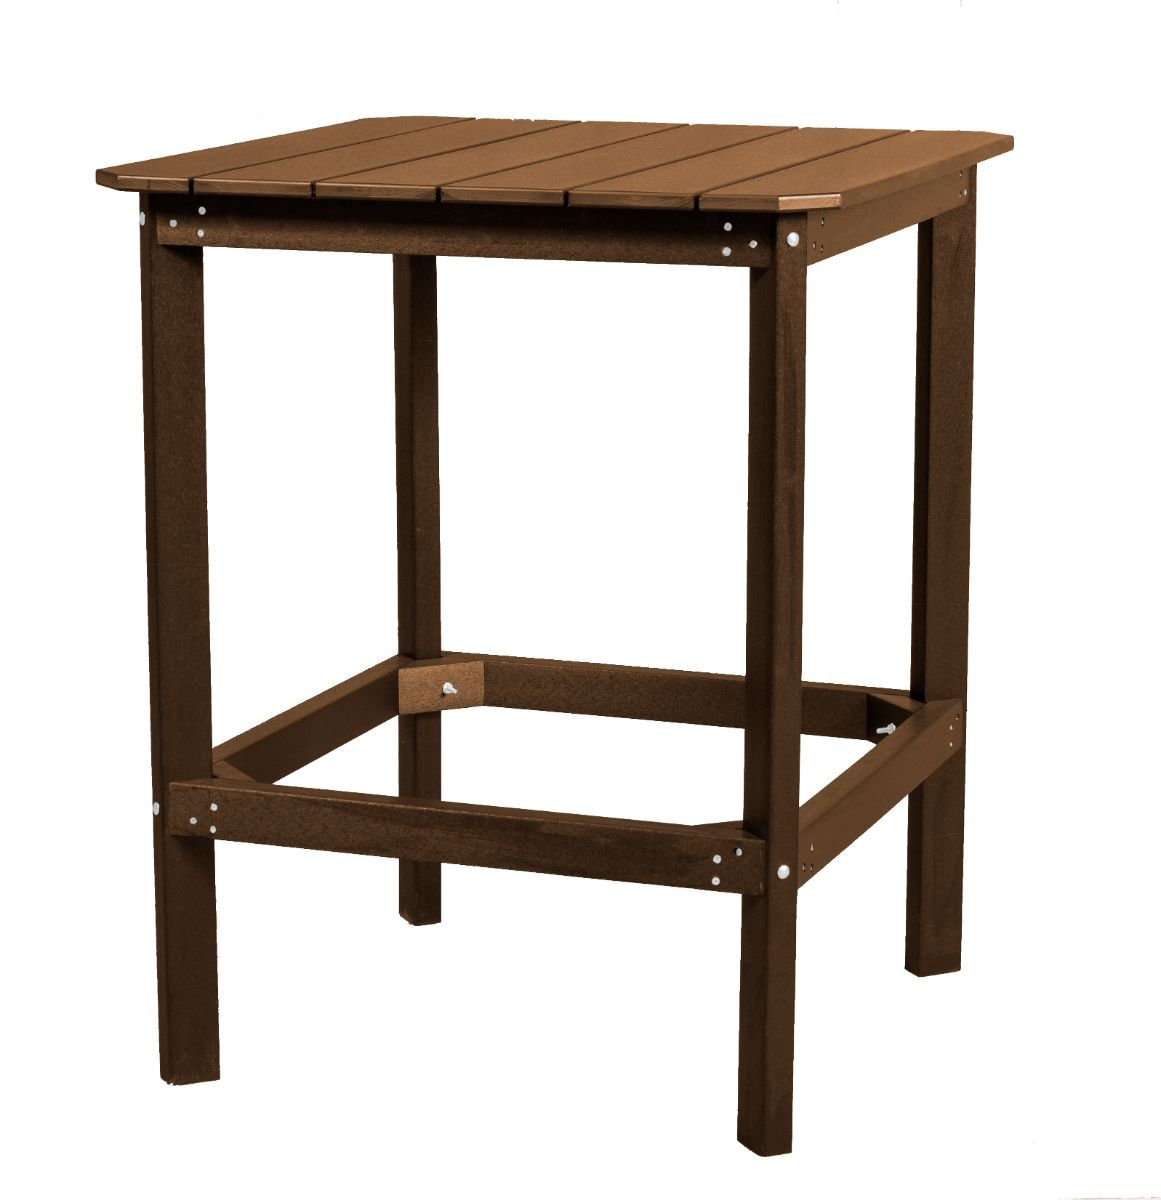 Tudor Brown Panama High Outdoor Dining Table